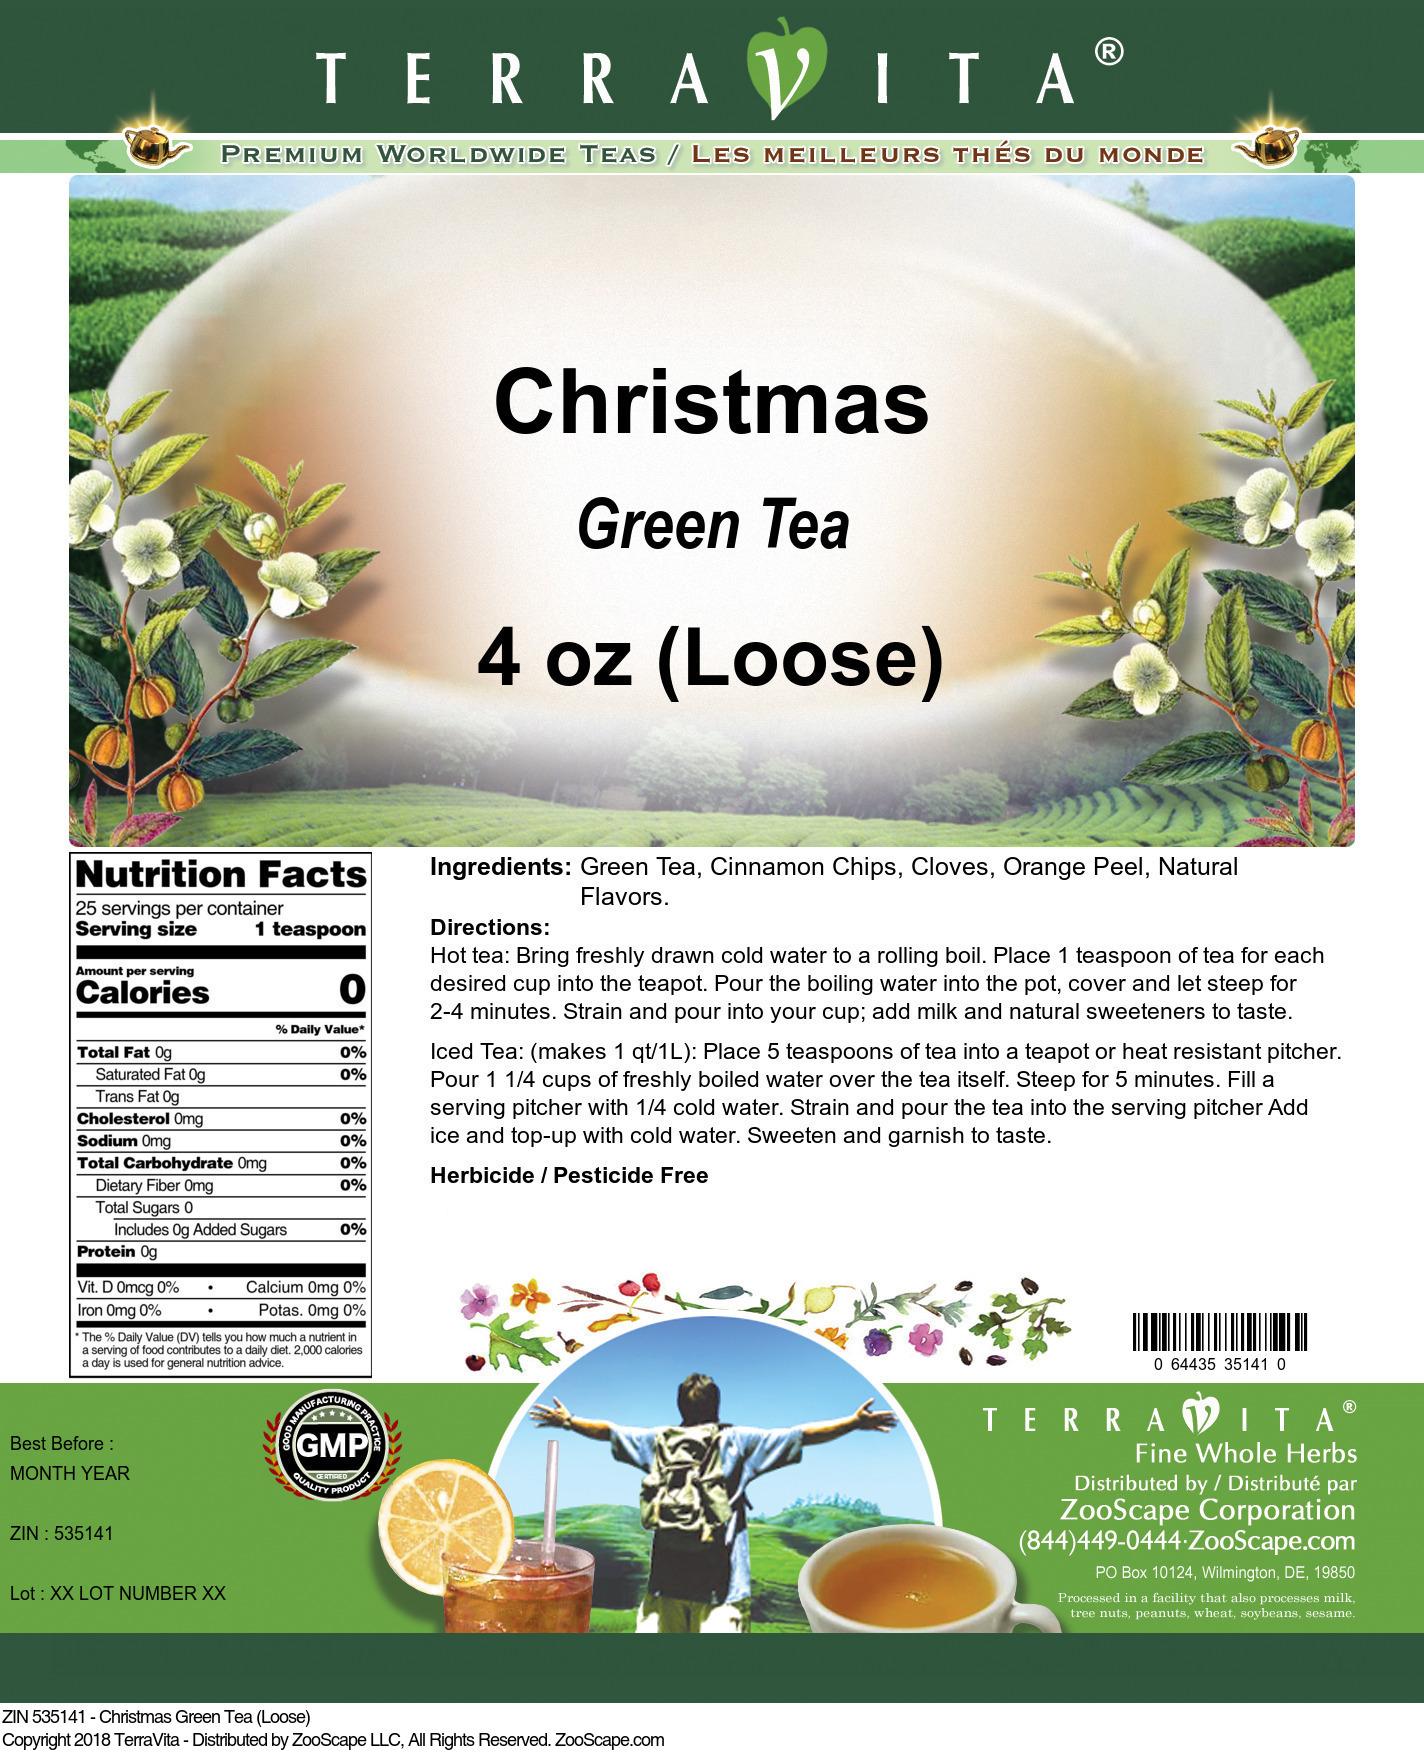 Christmas Green Tea (Loose)